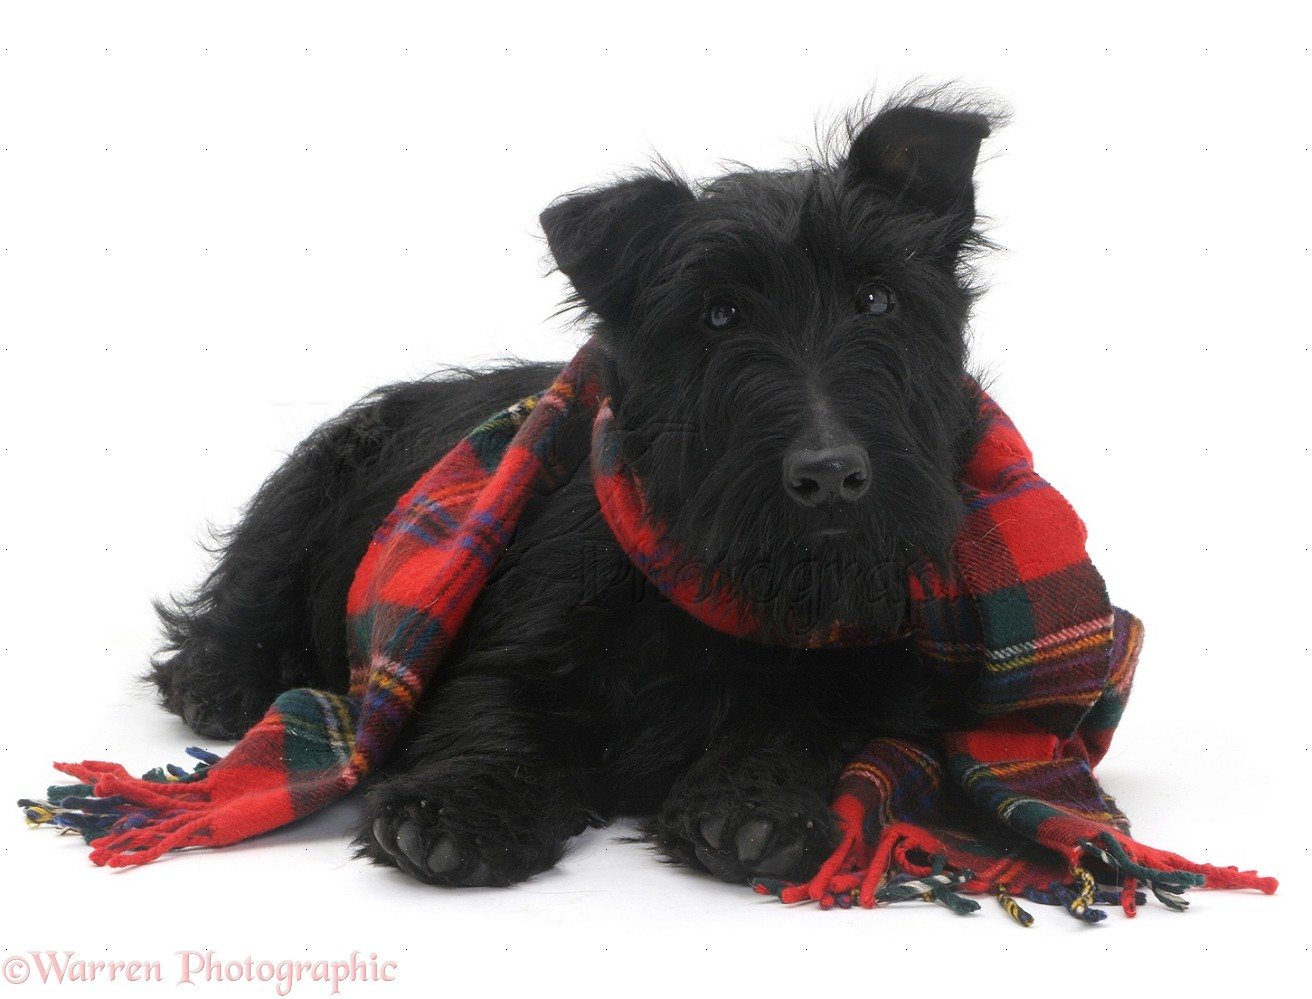 08972 Scottie dog with a tartan scarf white background - Scotland votes 'No'